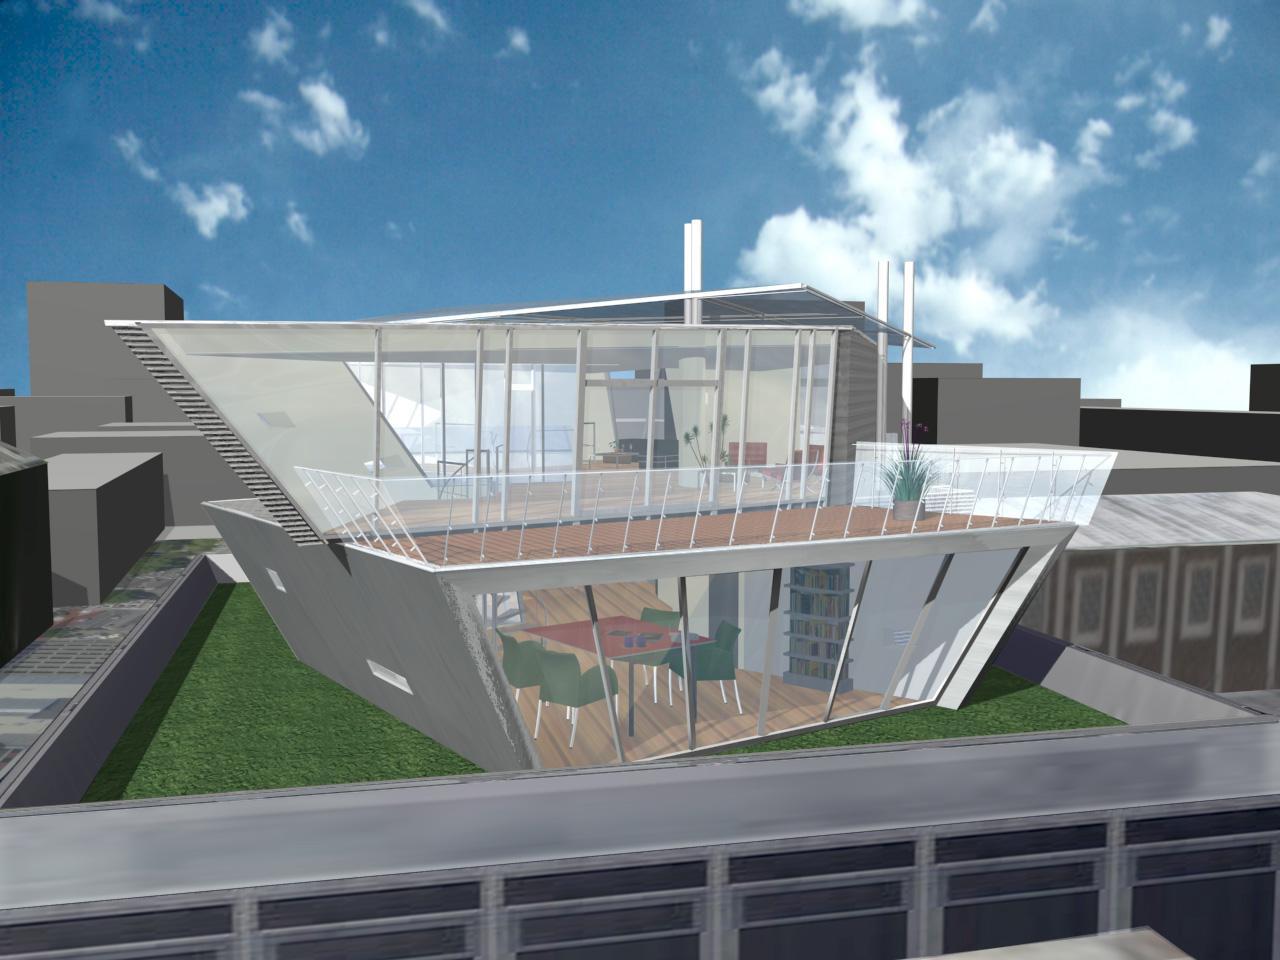 Jos de Bruin developed a tool for algorithmically generating penthouse designs based on a high-level specification (Image: Artificial Design/Jos de Bruin/Archipel Ontwerpers)